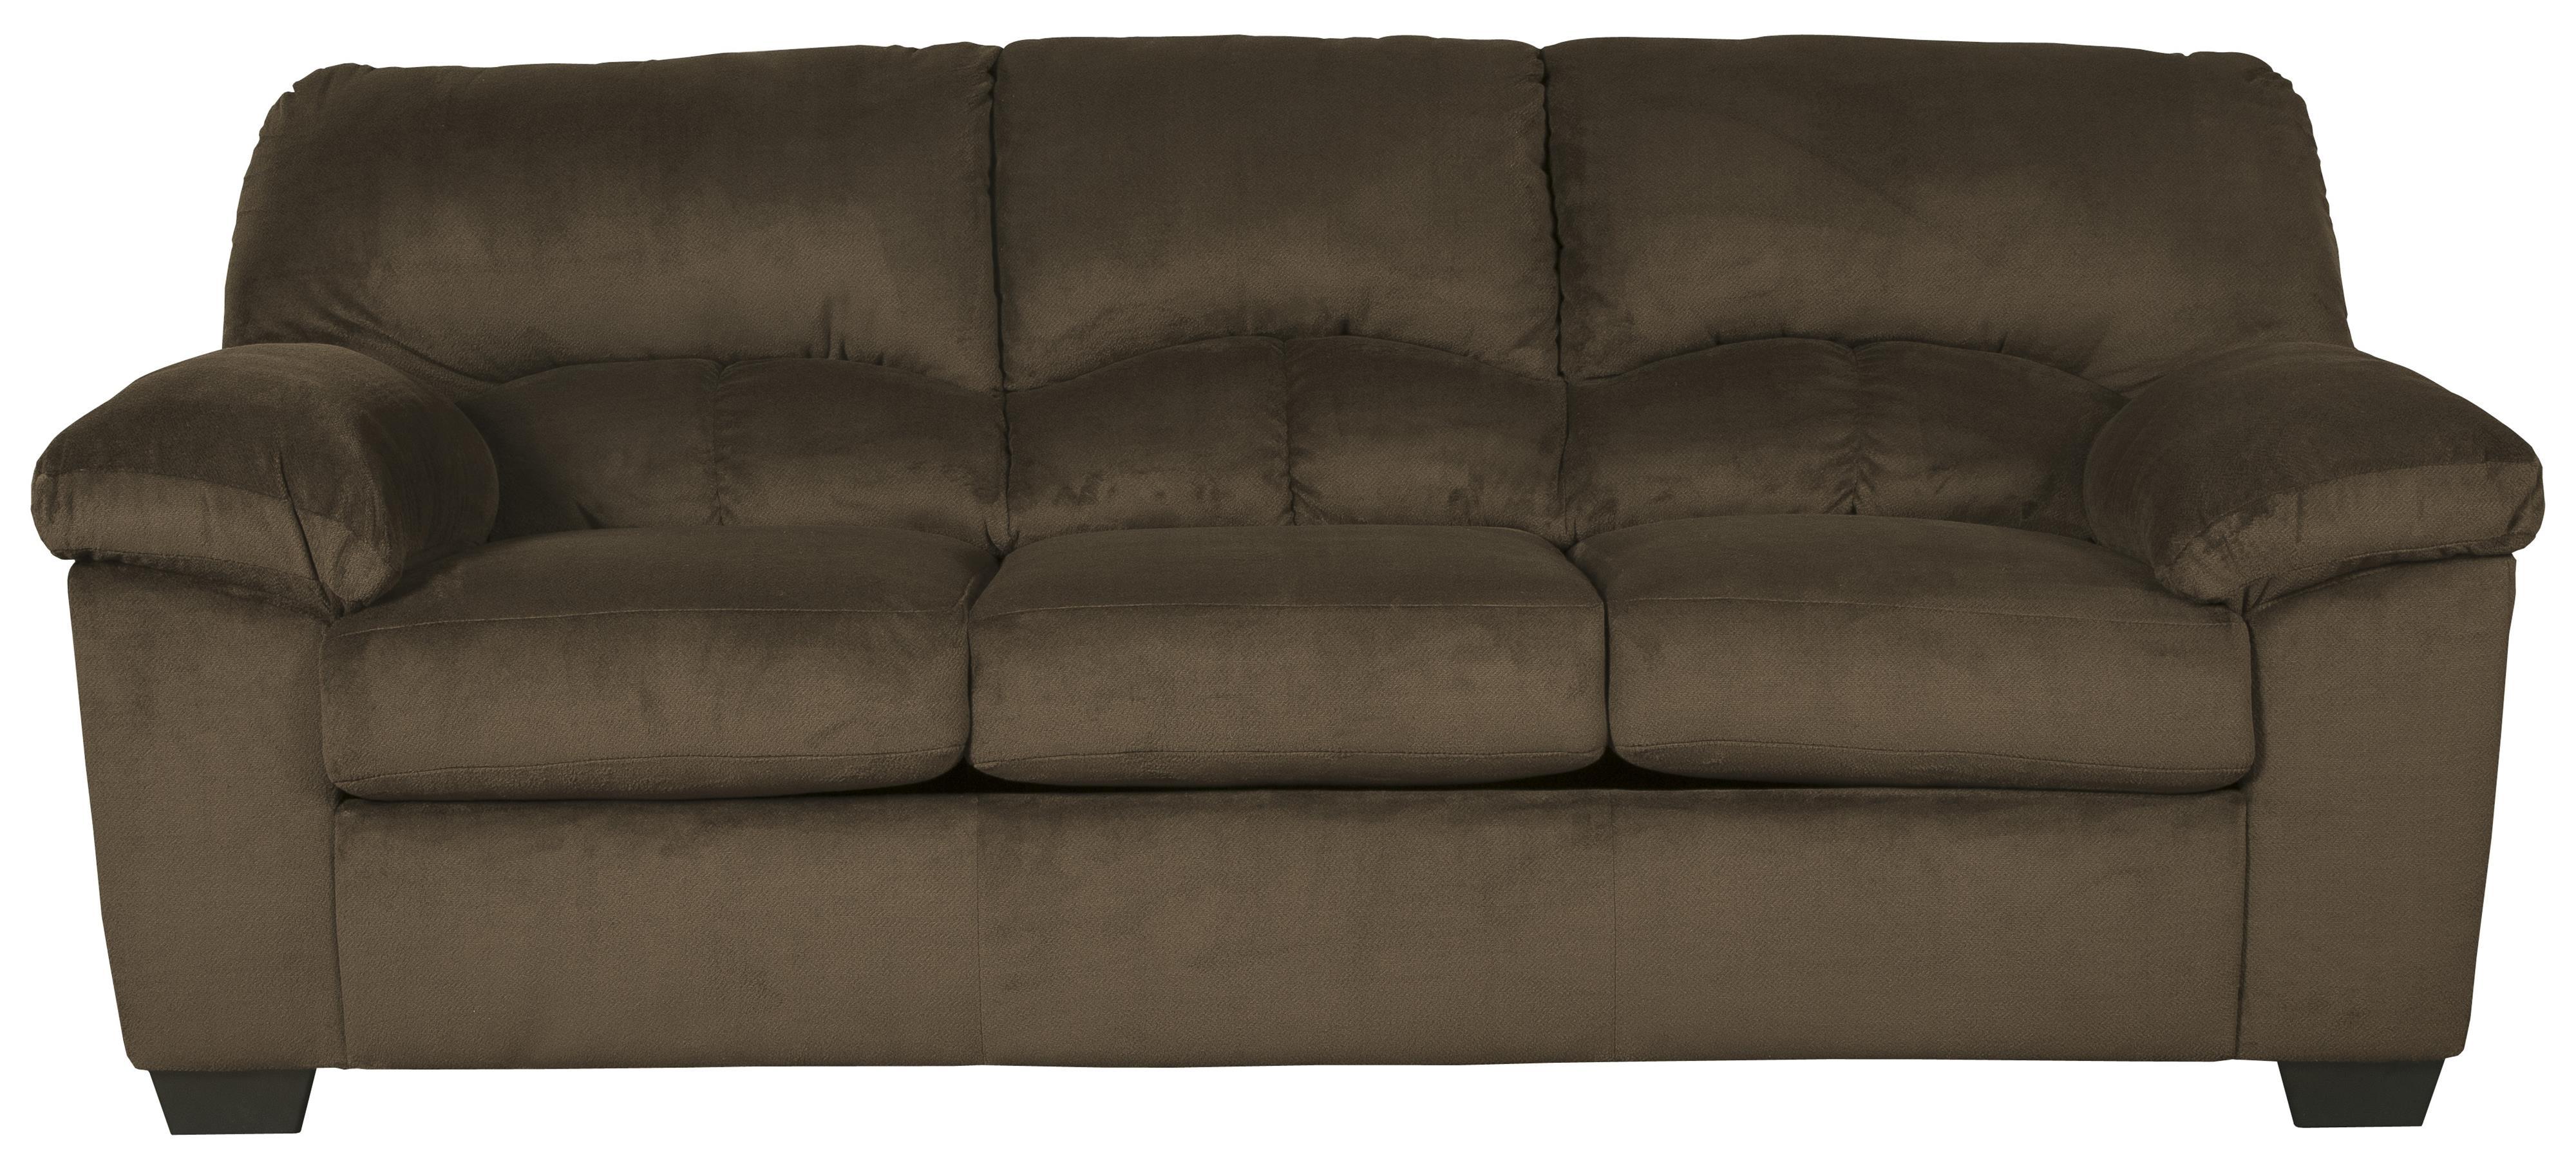 Signature Design by Ashley Dailey Full Sofa Sleeper - Item Number: 9540336